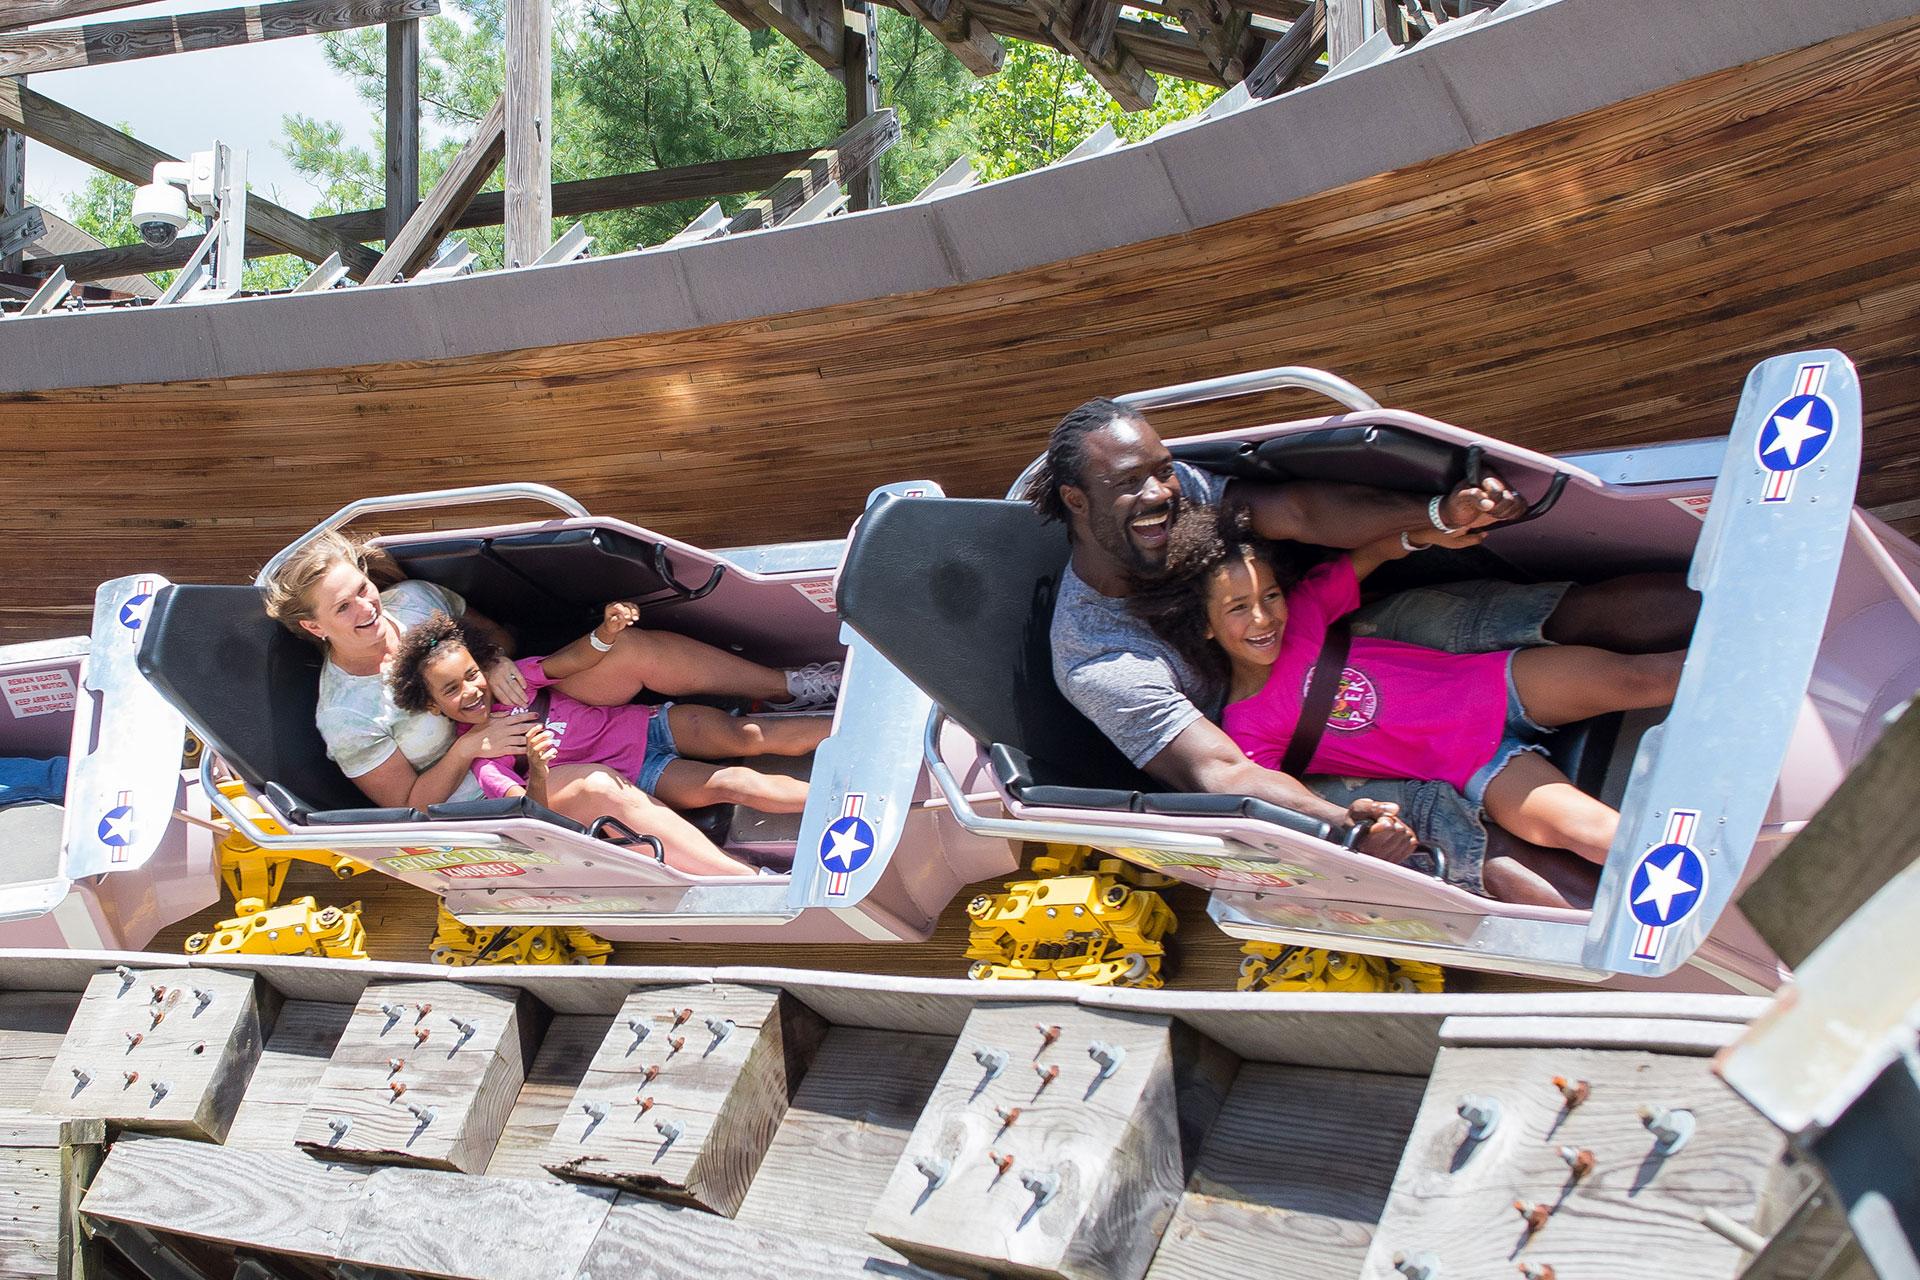 Family on Ride at Knoebels; Courtesy of Knoebels Amusement Resort